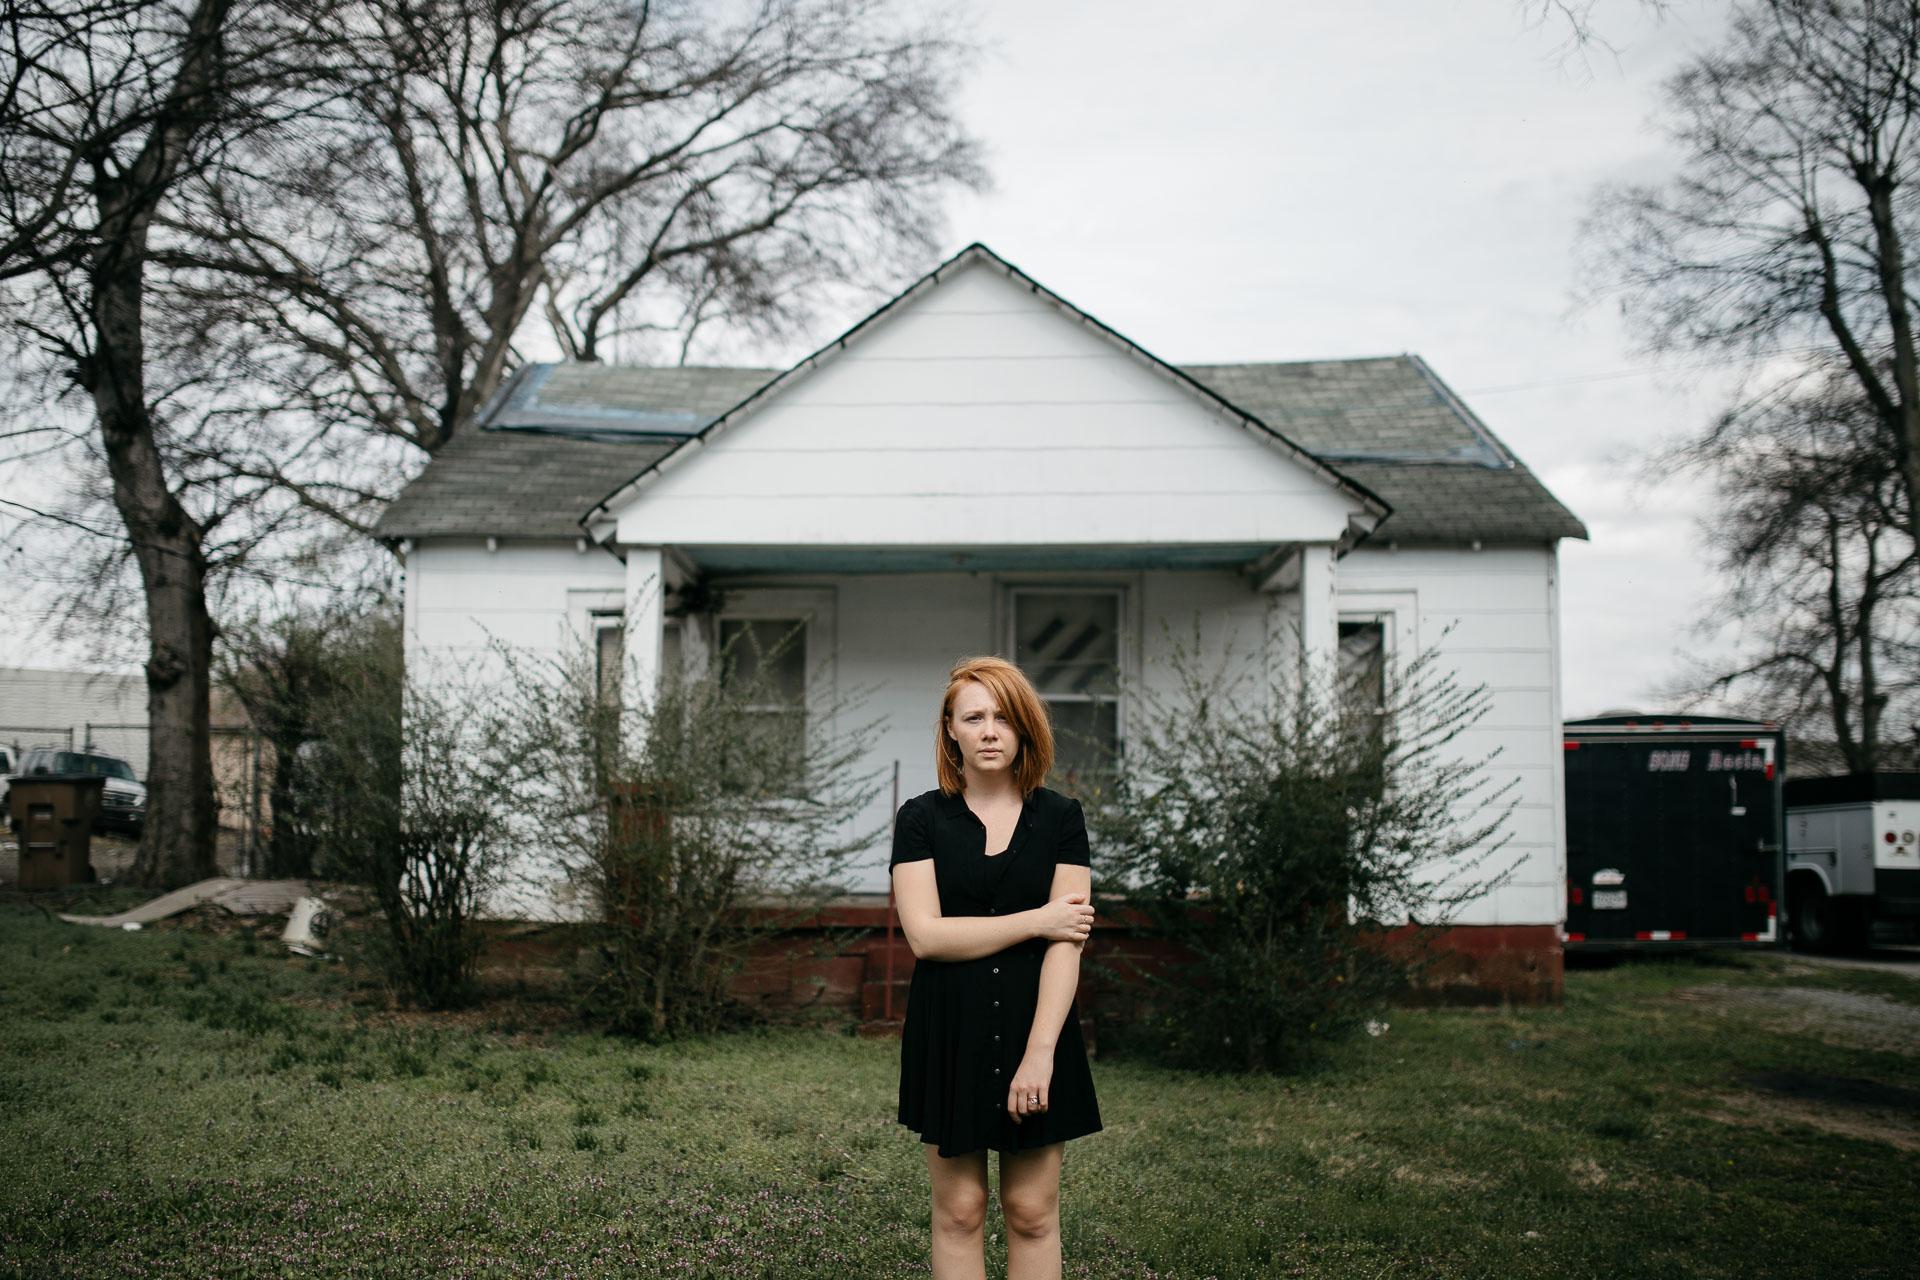 Portrait Nashville Photographer : Nicola, by Jean-Laurent Gaudy Photography